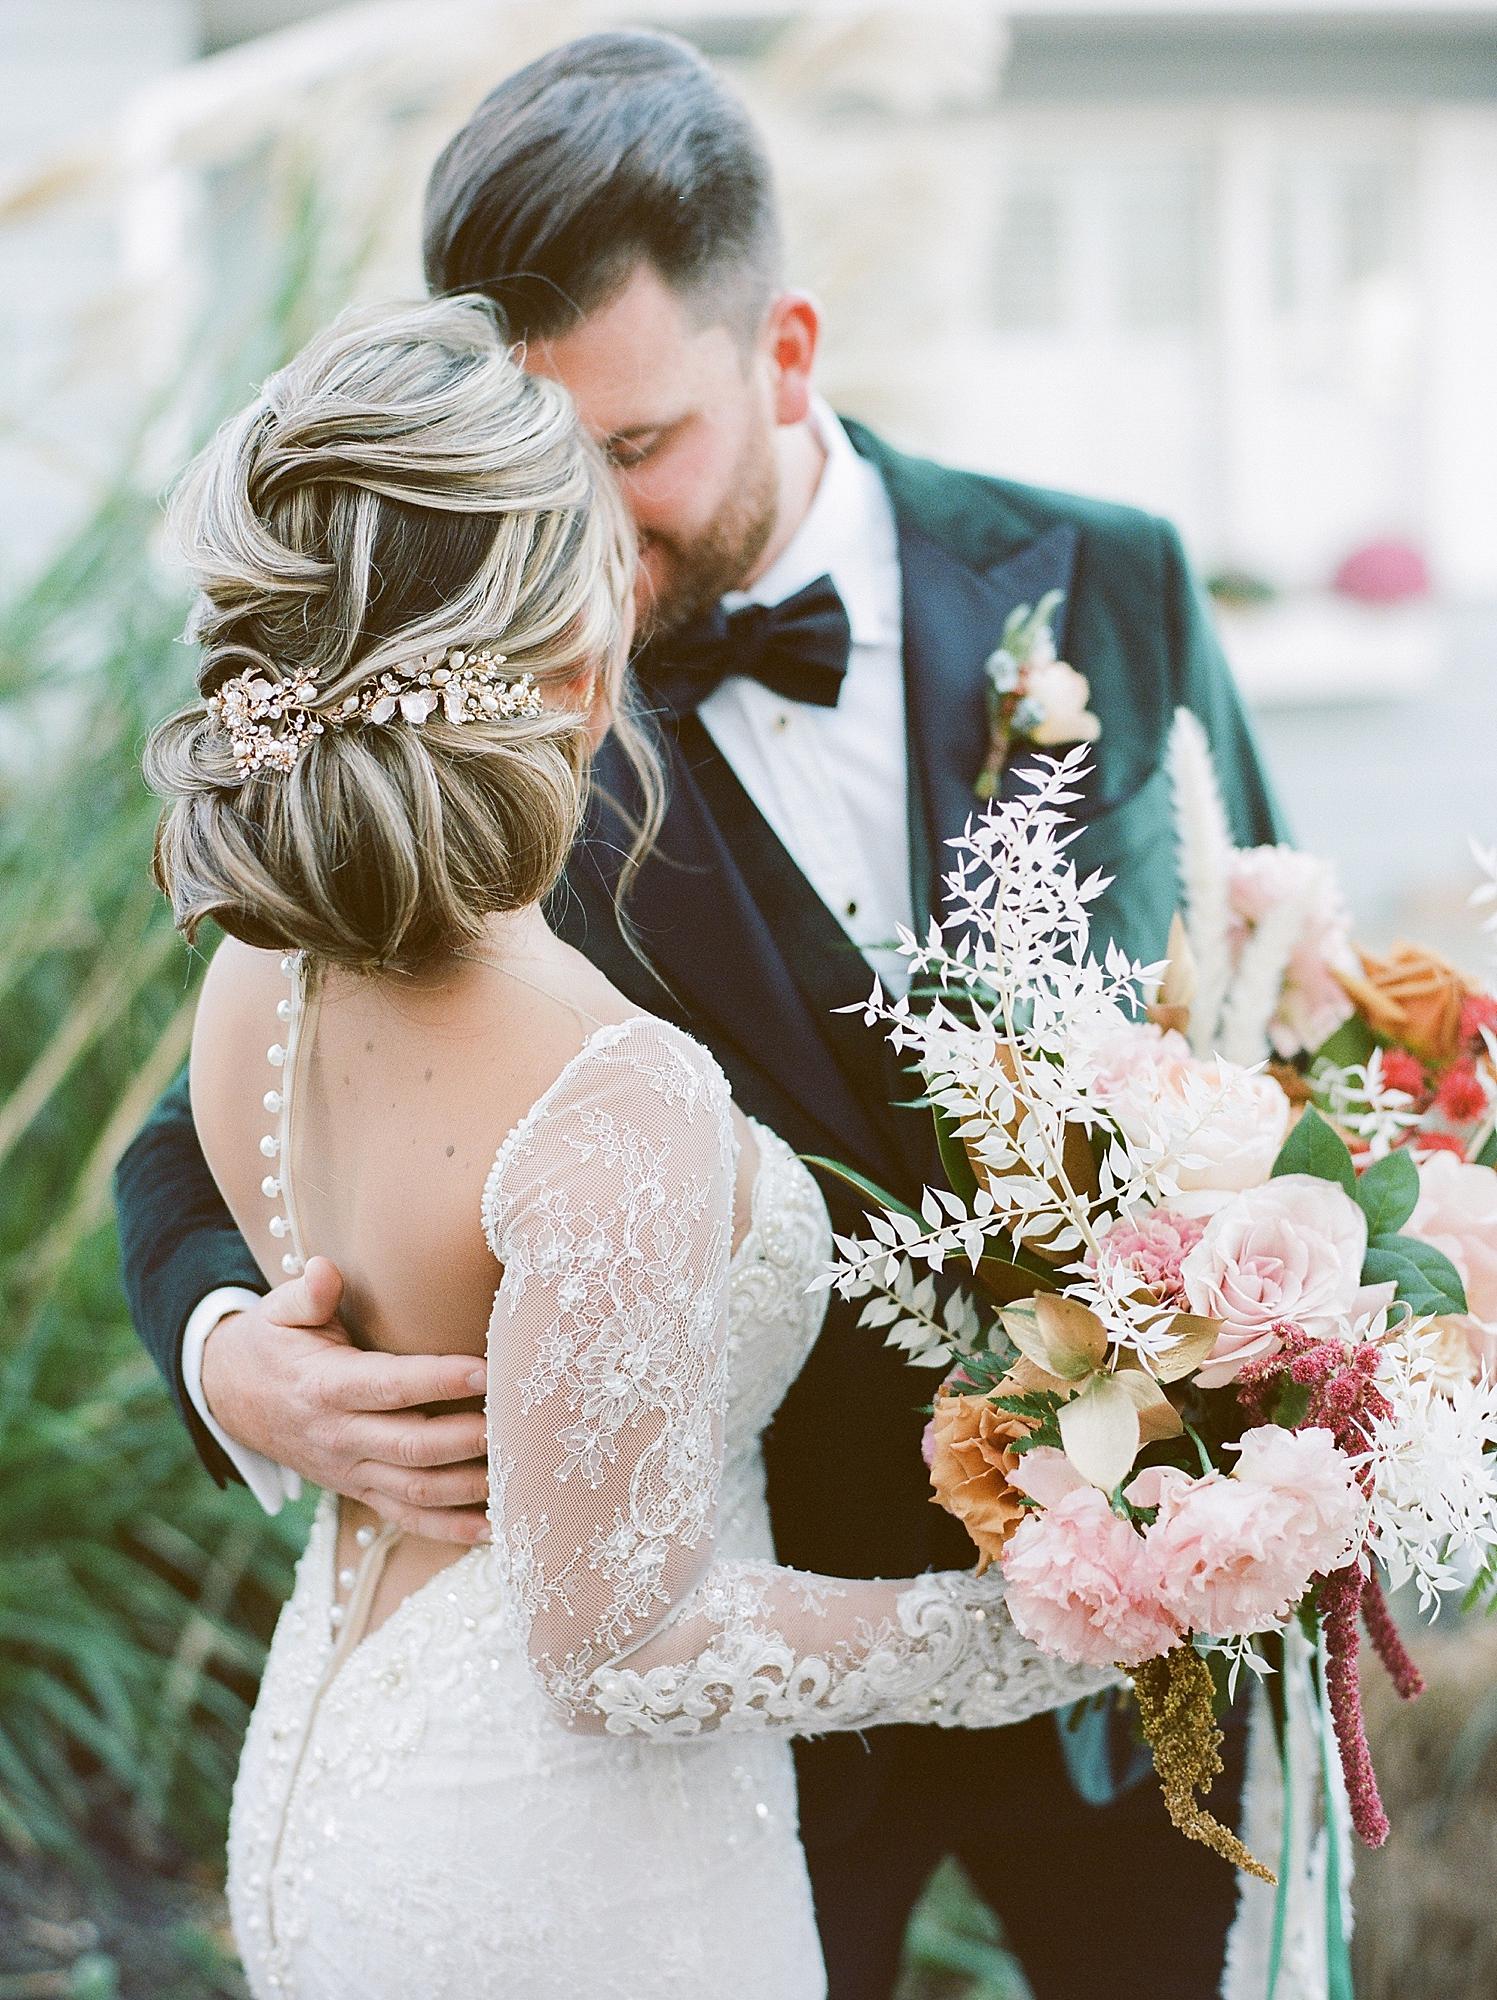 Bonnet Island Estate Film Wedding Photography by Magdalena Studios 0027